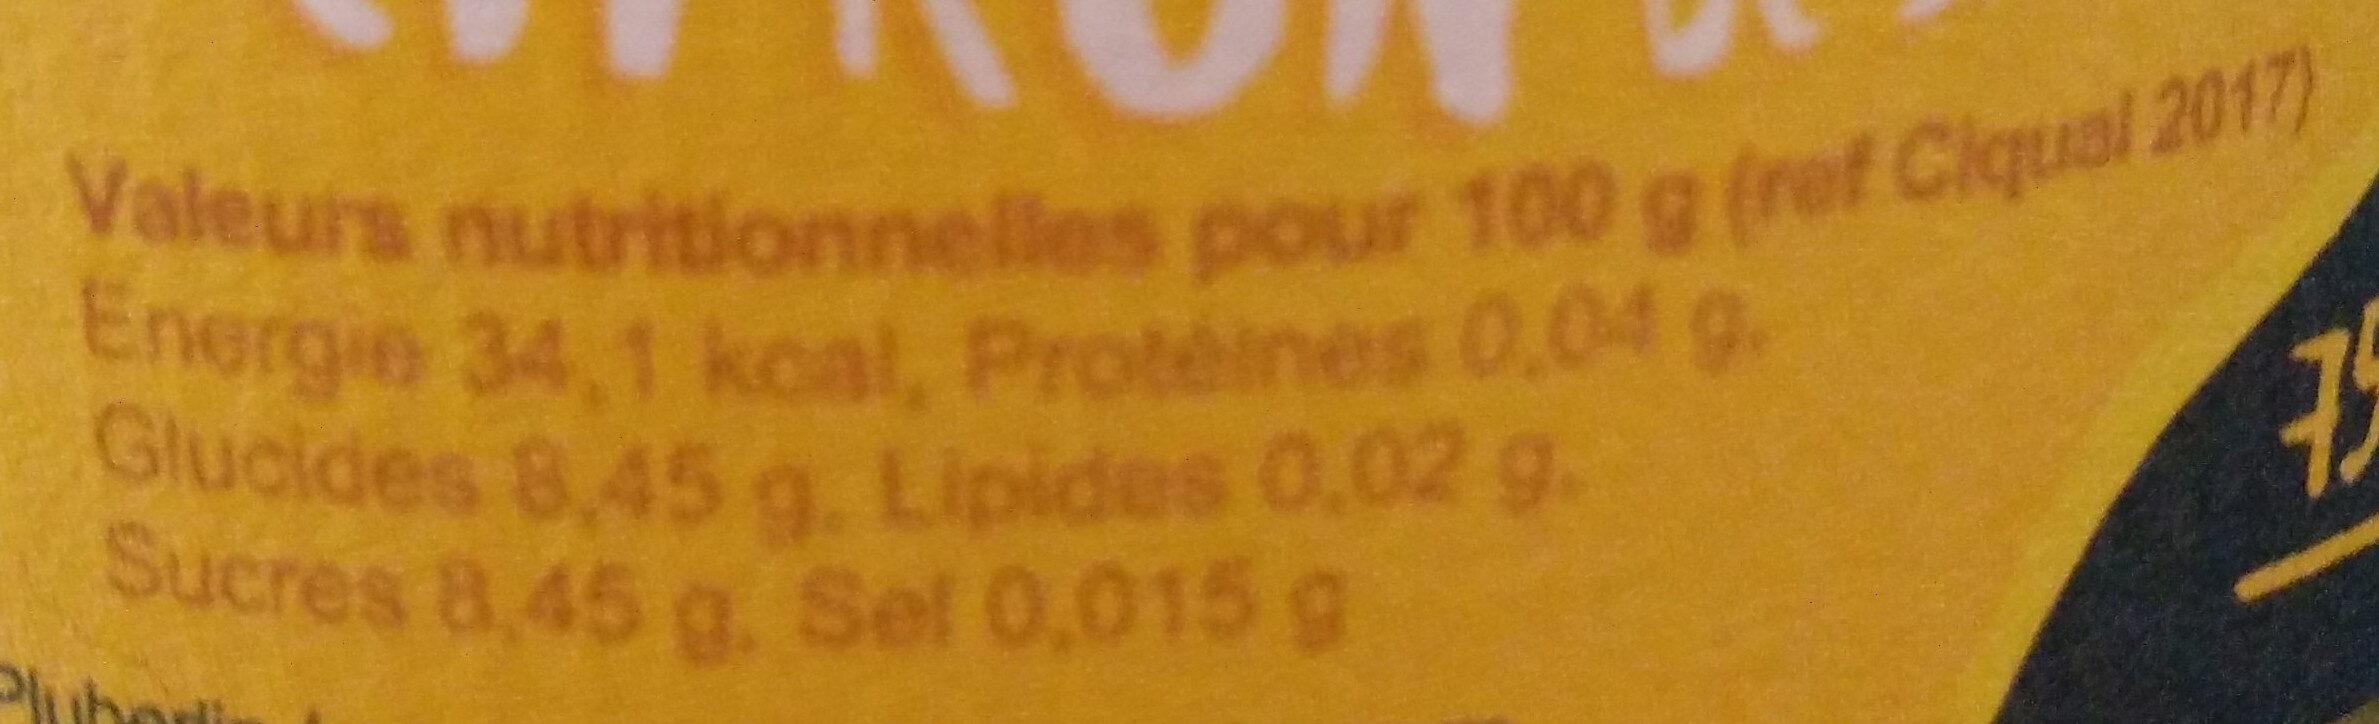 Limo La Lutine - Limonade - Voedingswaarden - fr